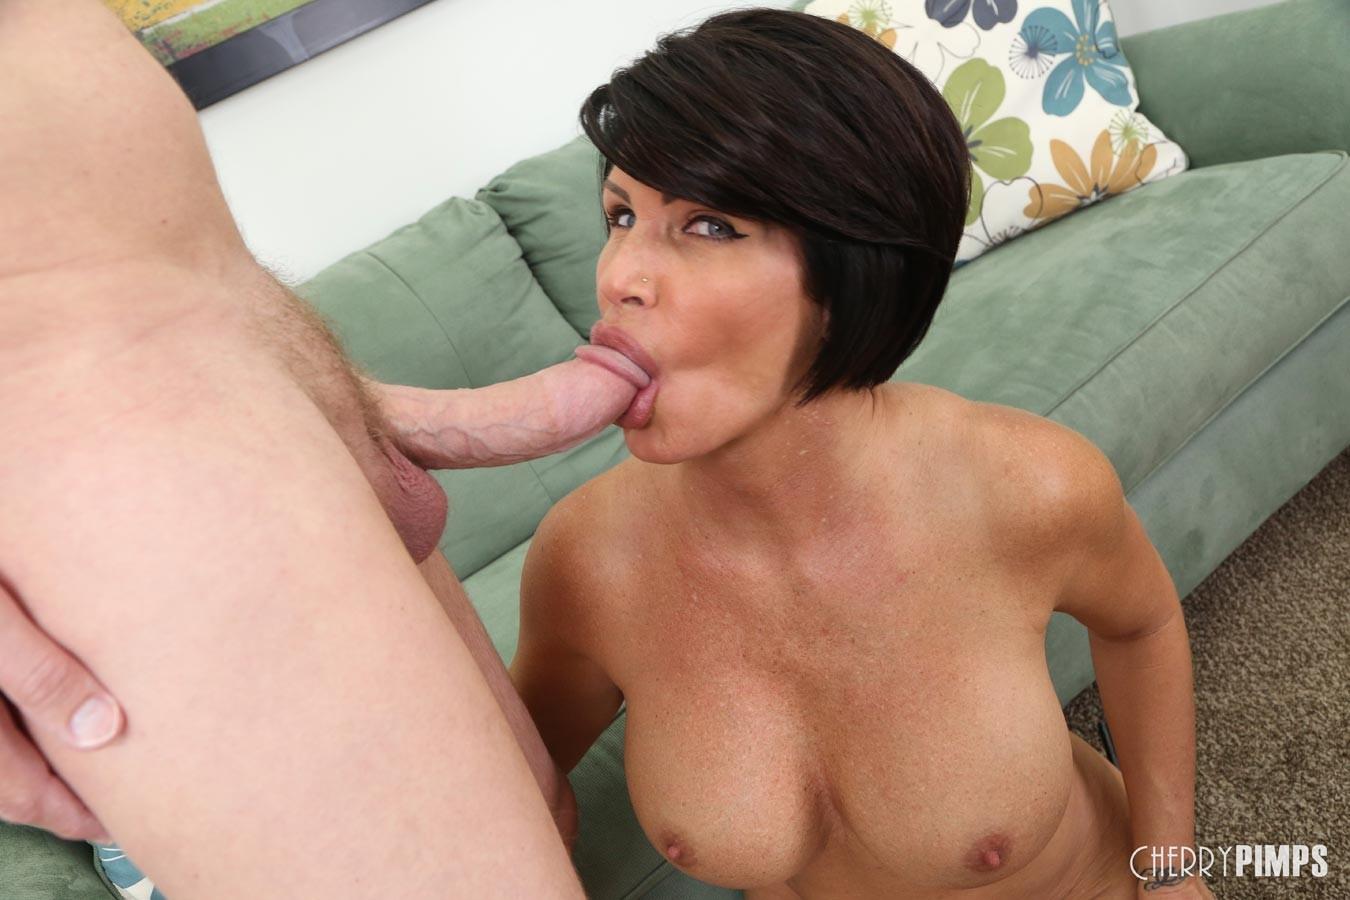 Jacqueline tits wwe